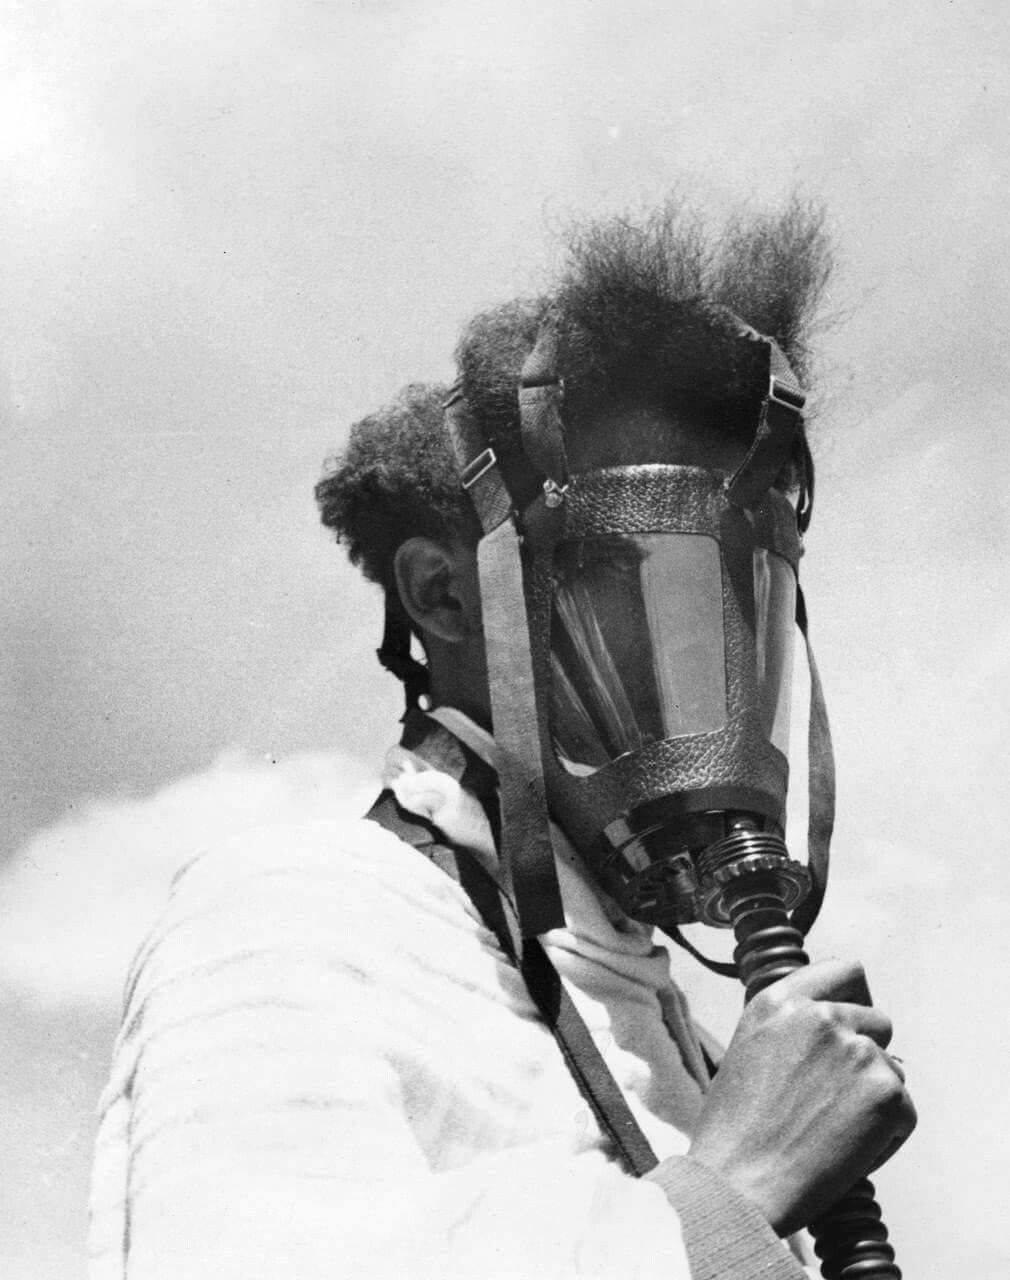 Des masques a gaz 12553010